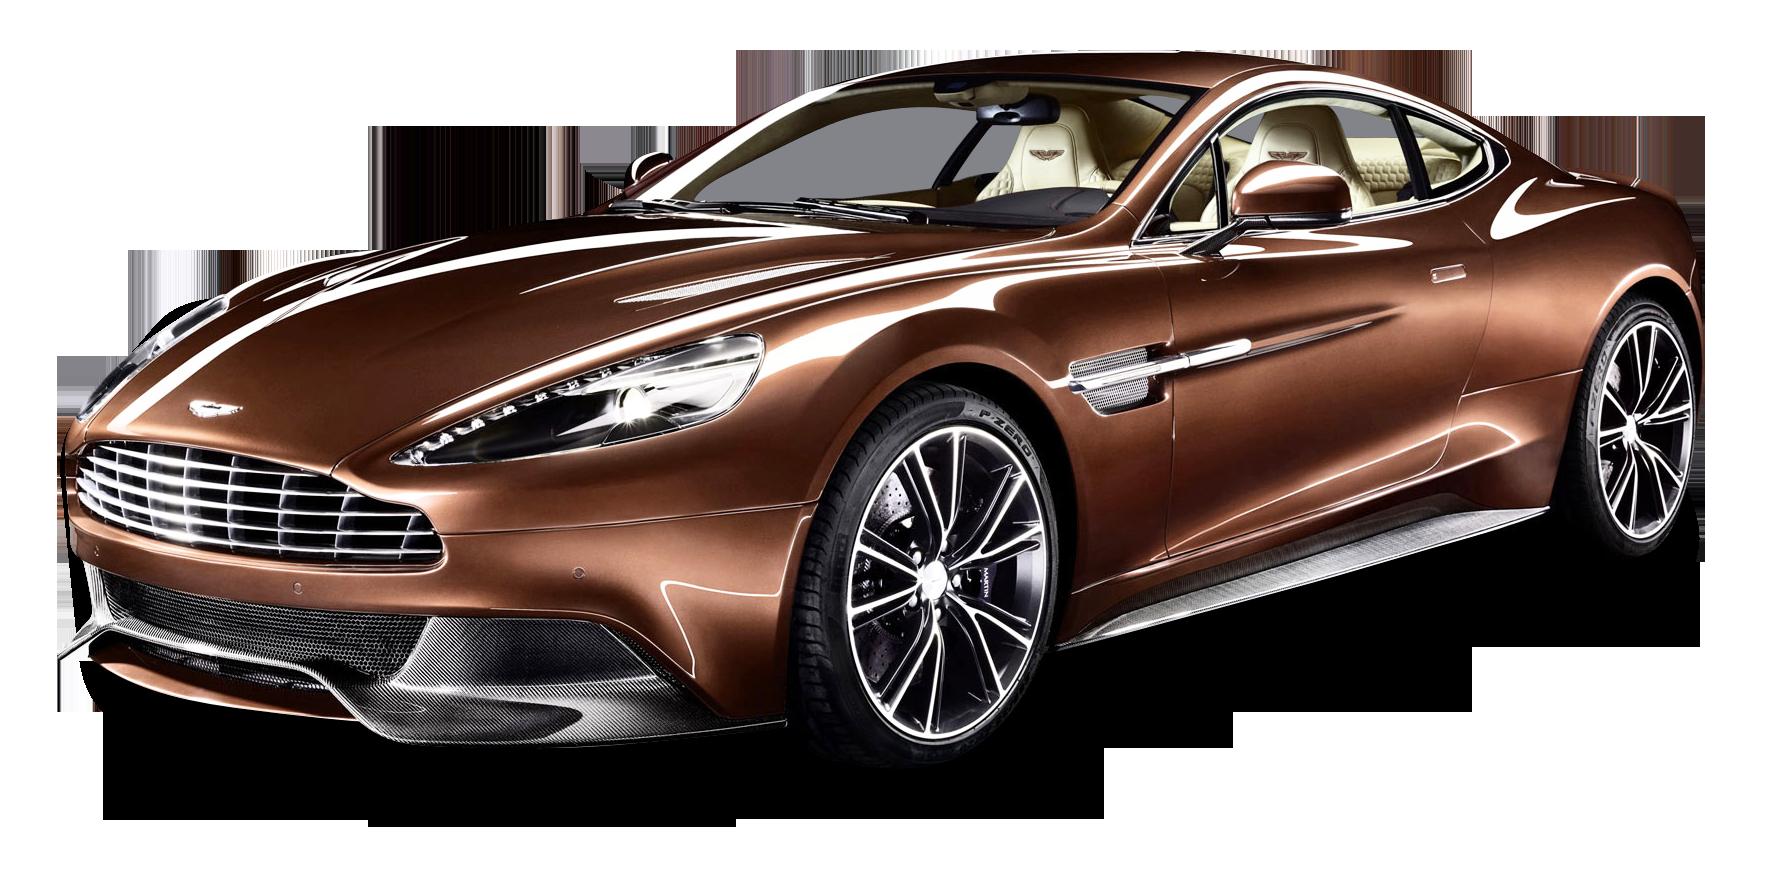 Aston Martin Vanquish Car PNG Image.